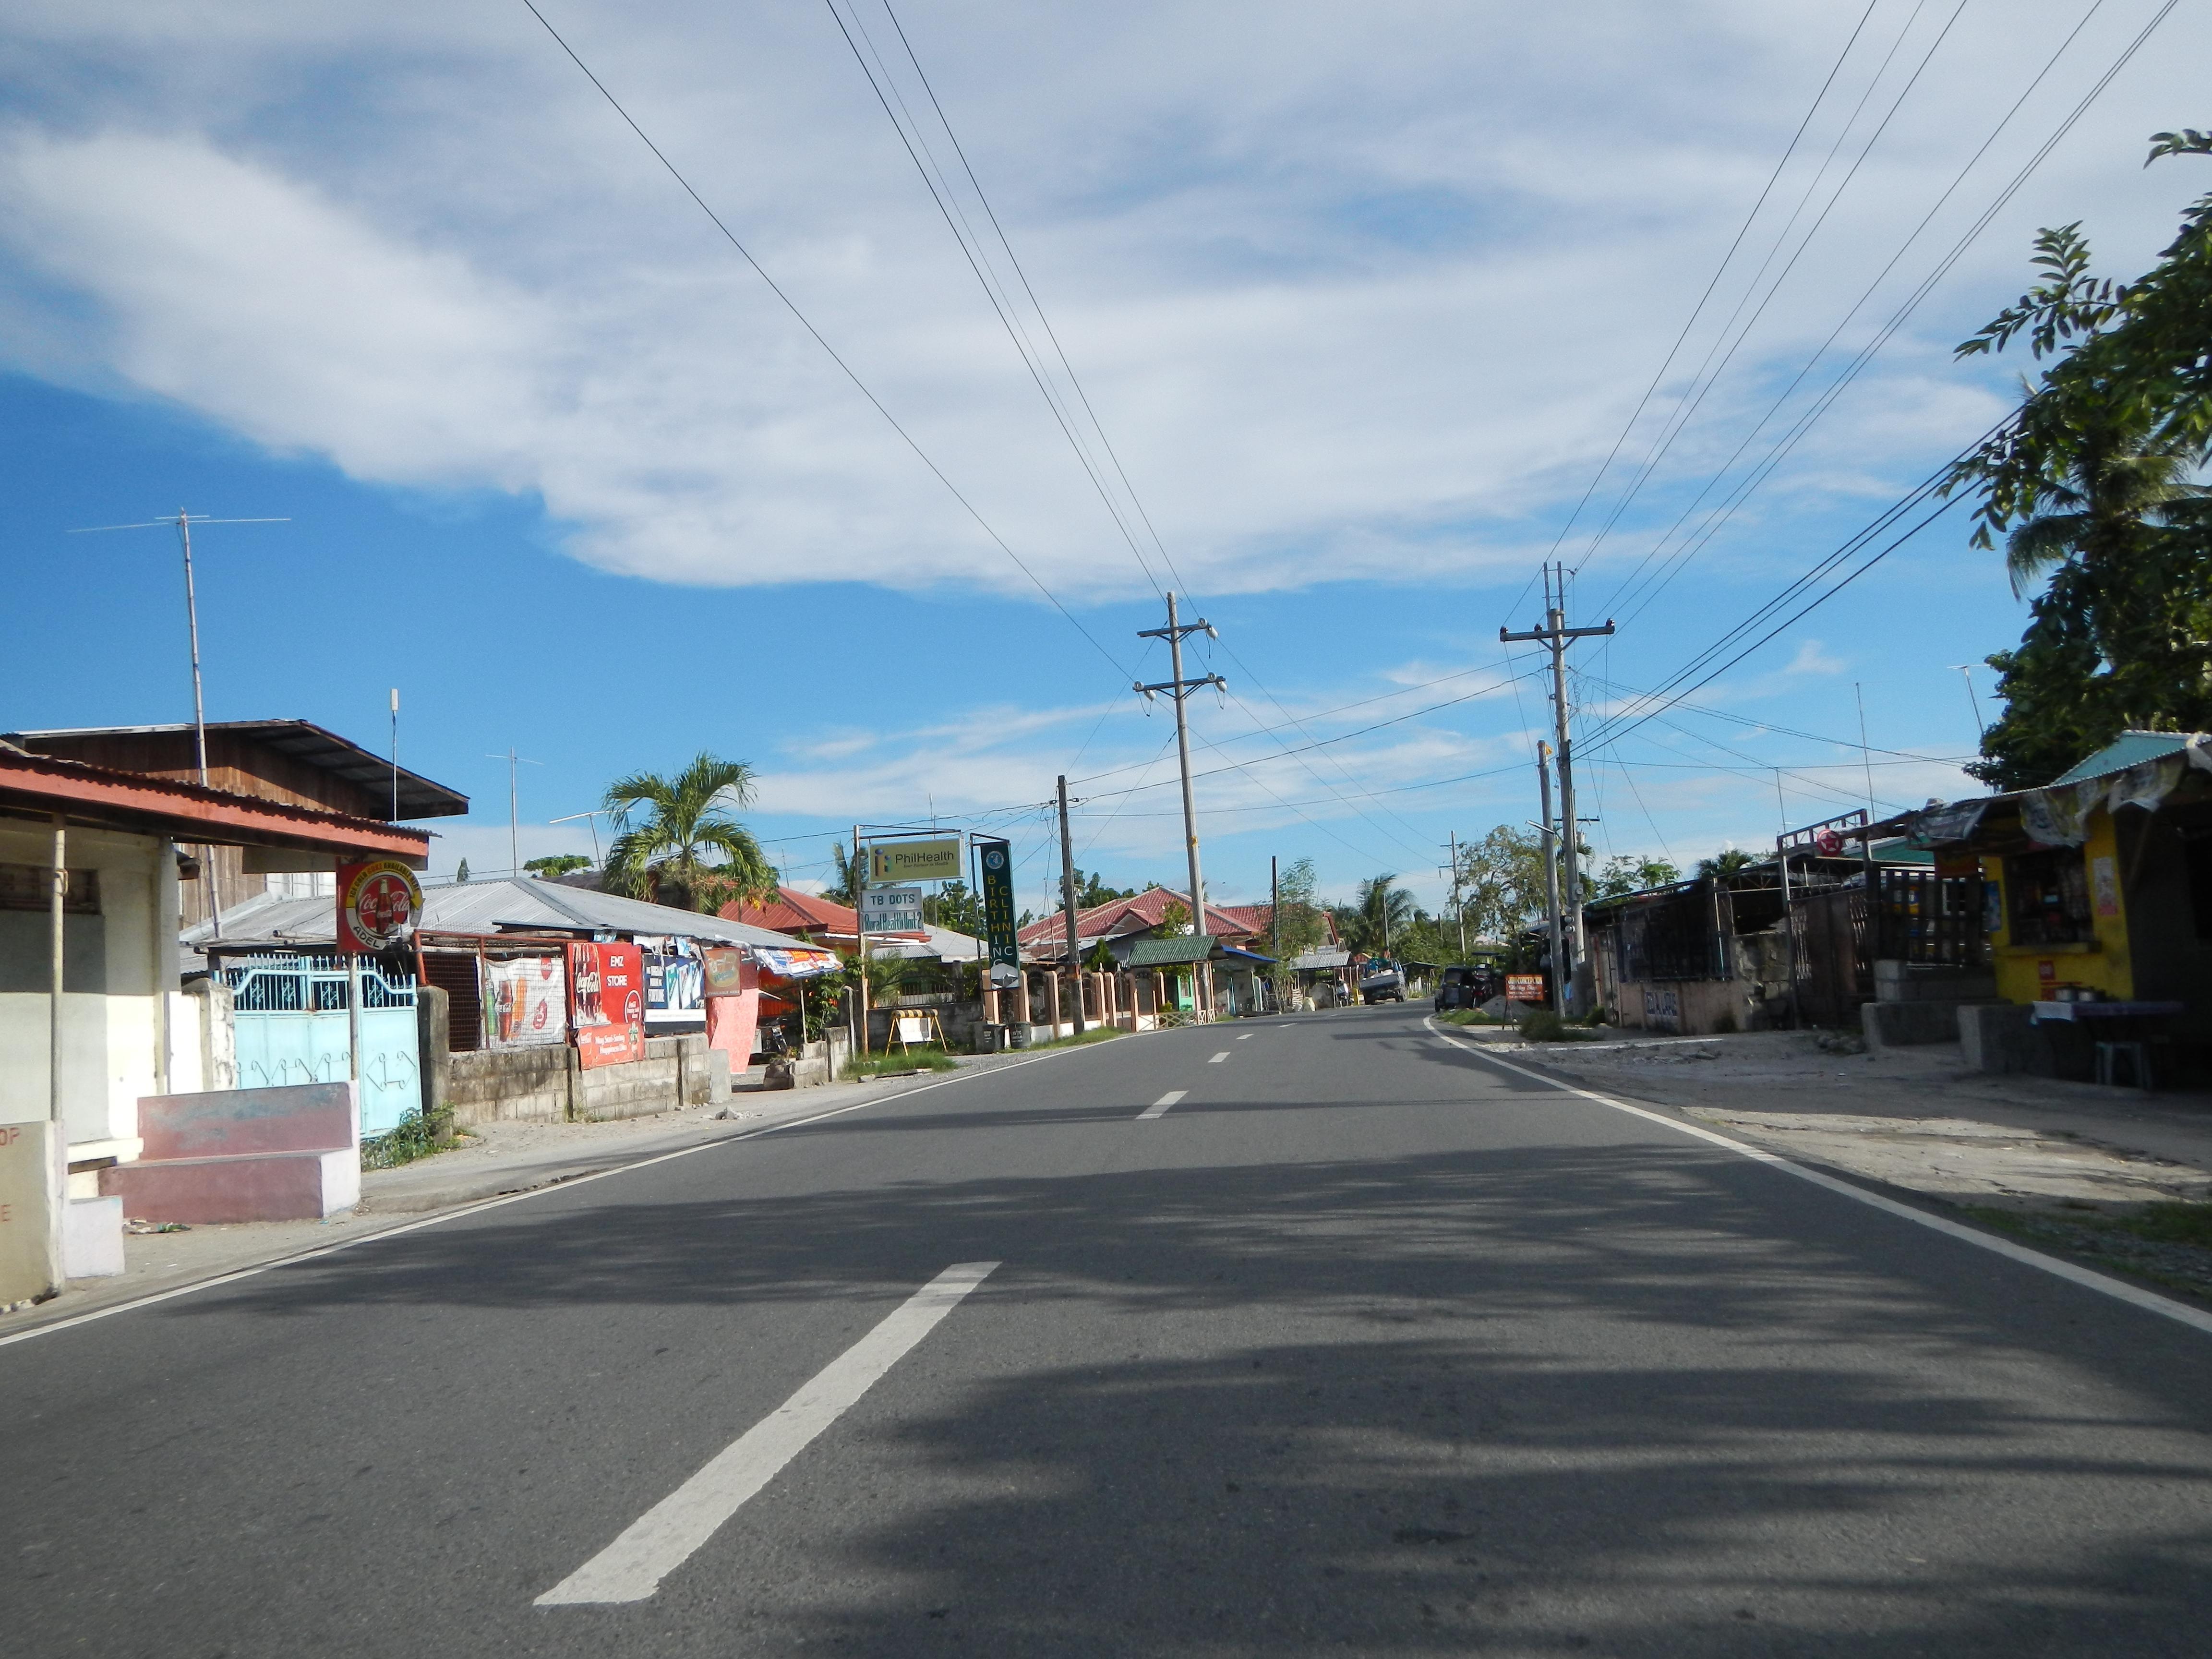 File:7605jfRizal Balanoy La Paz Hall Roads Tarlacfvf 05 ...